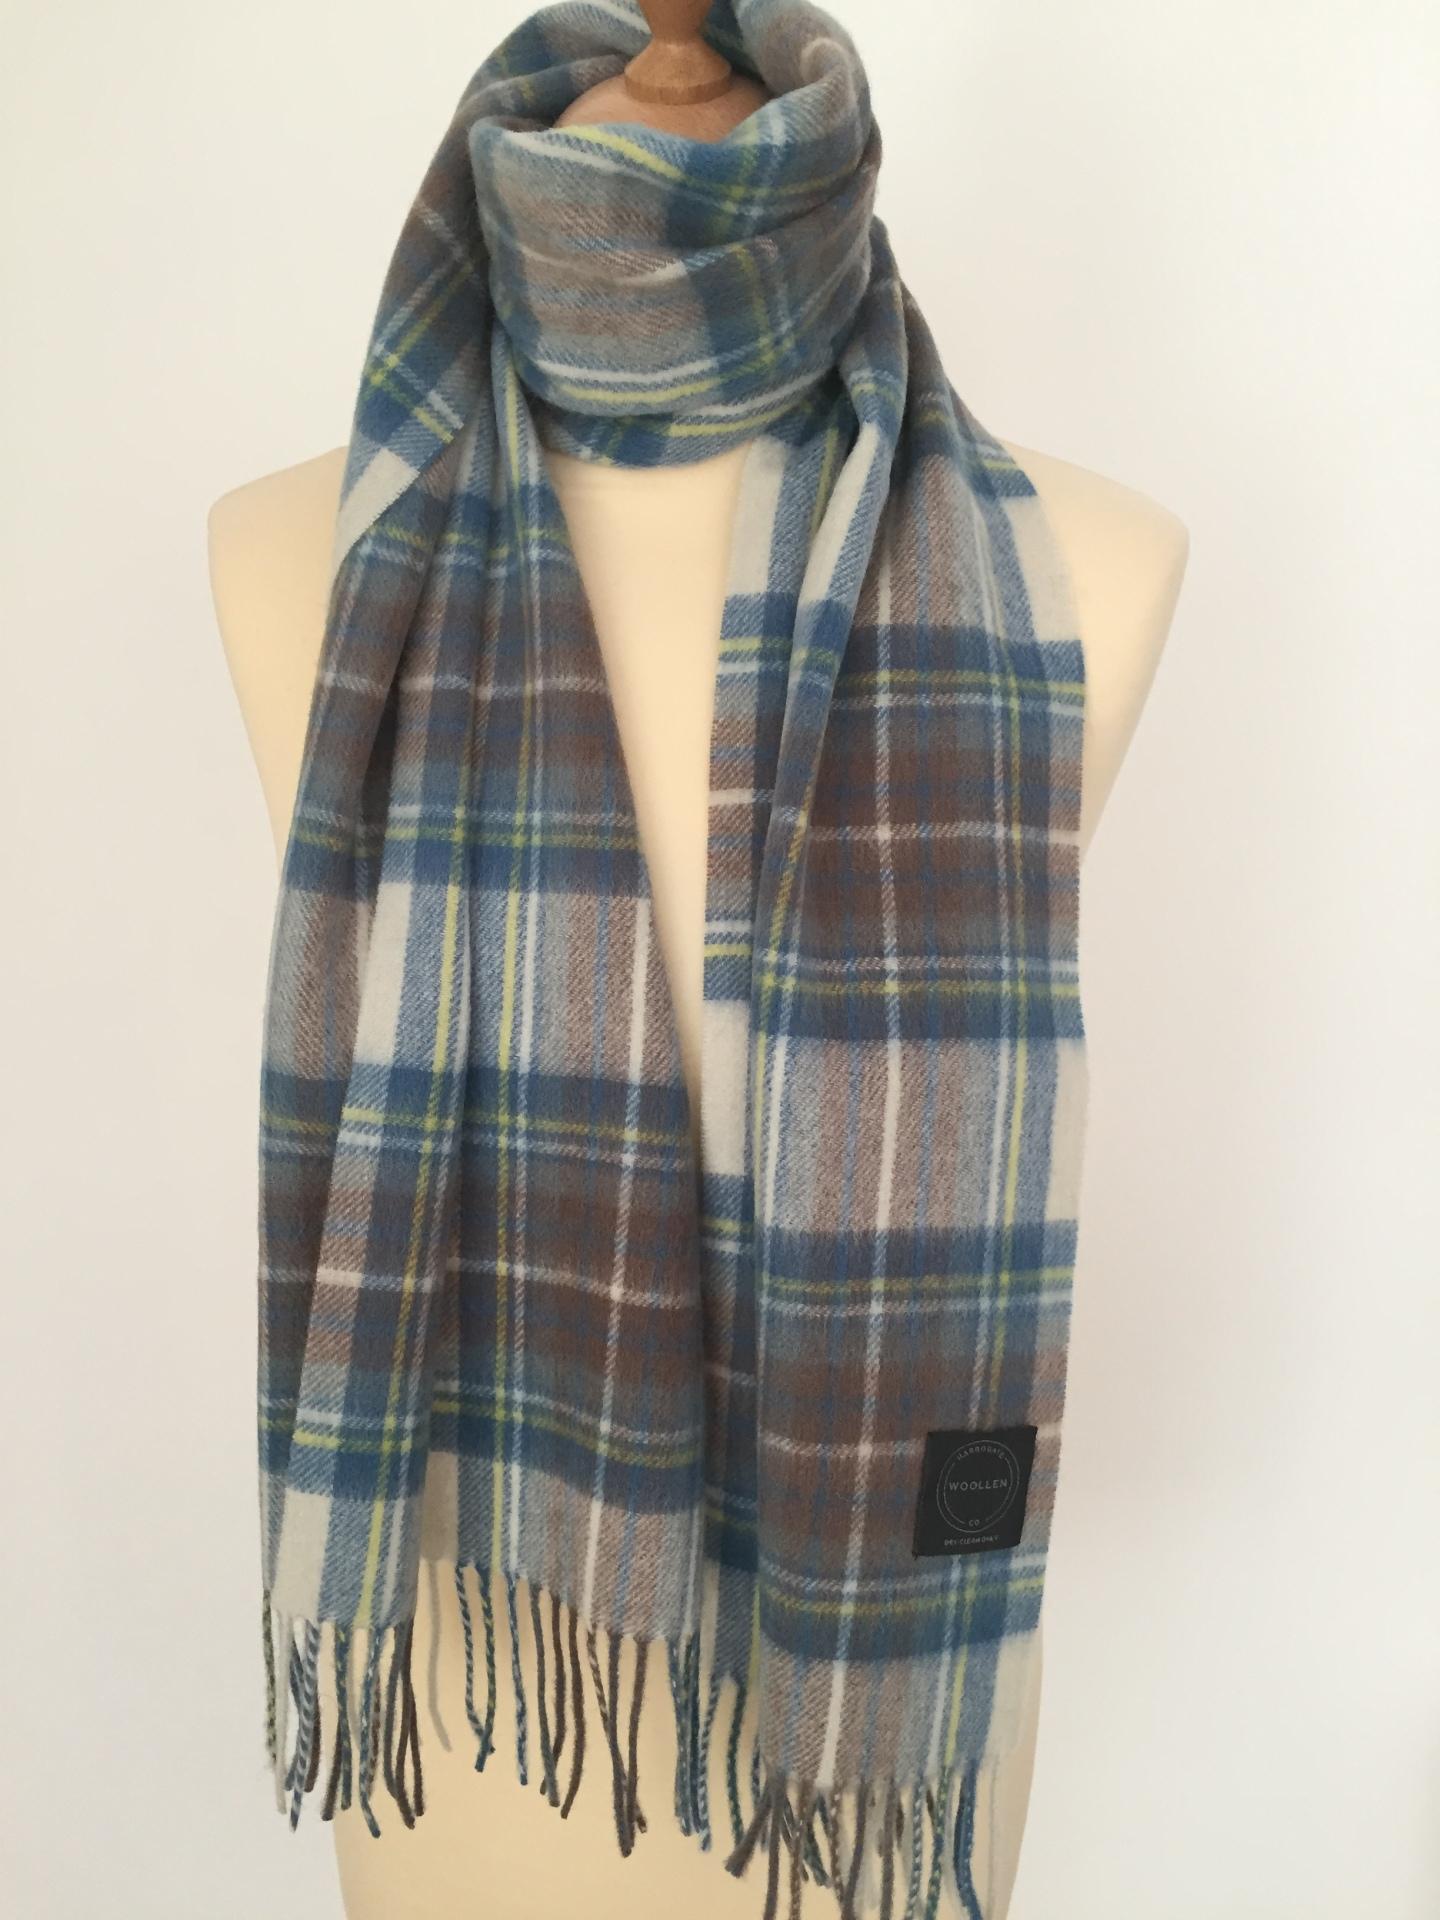 MB Stewart Tartan Lambswool scarf